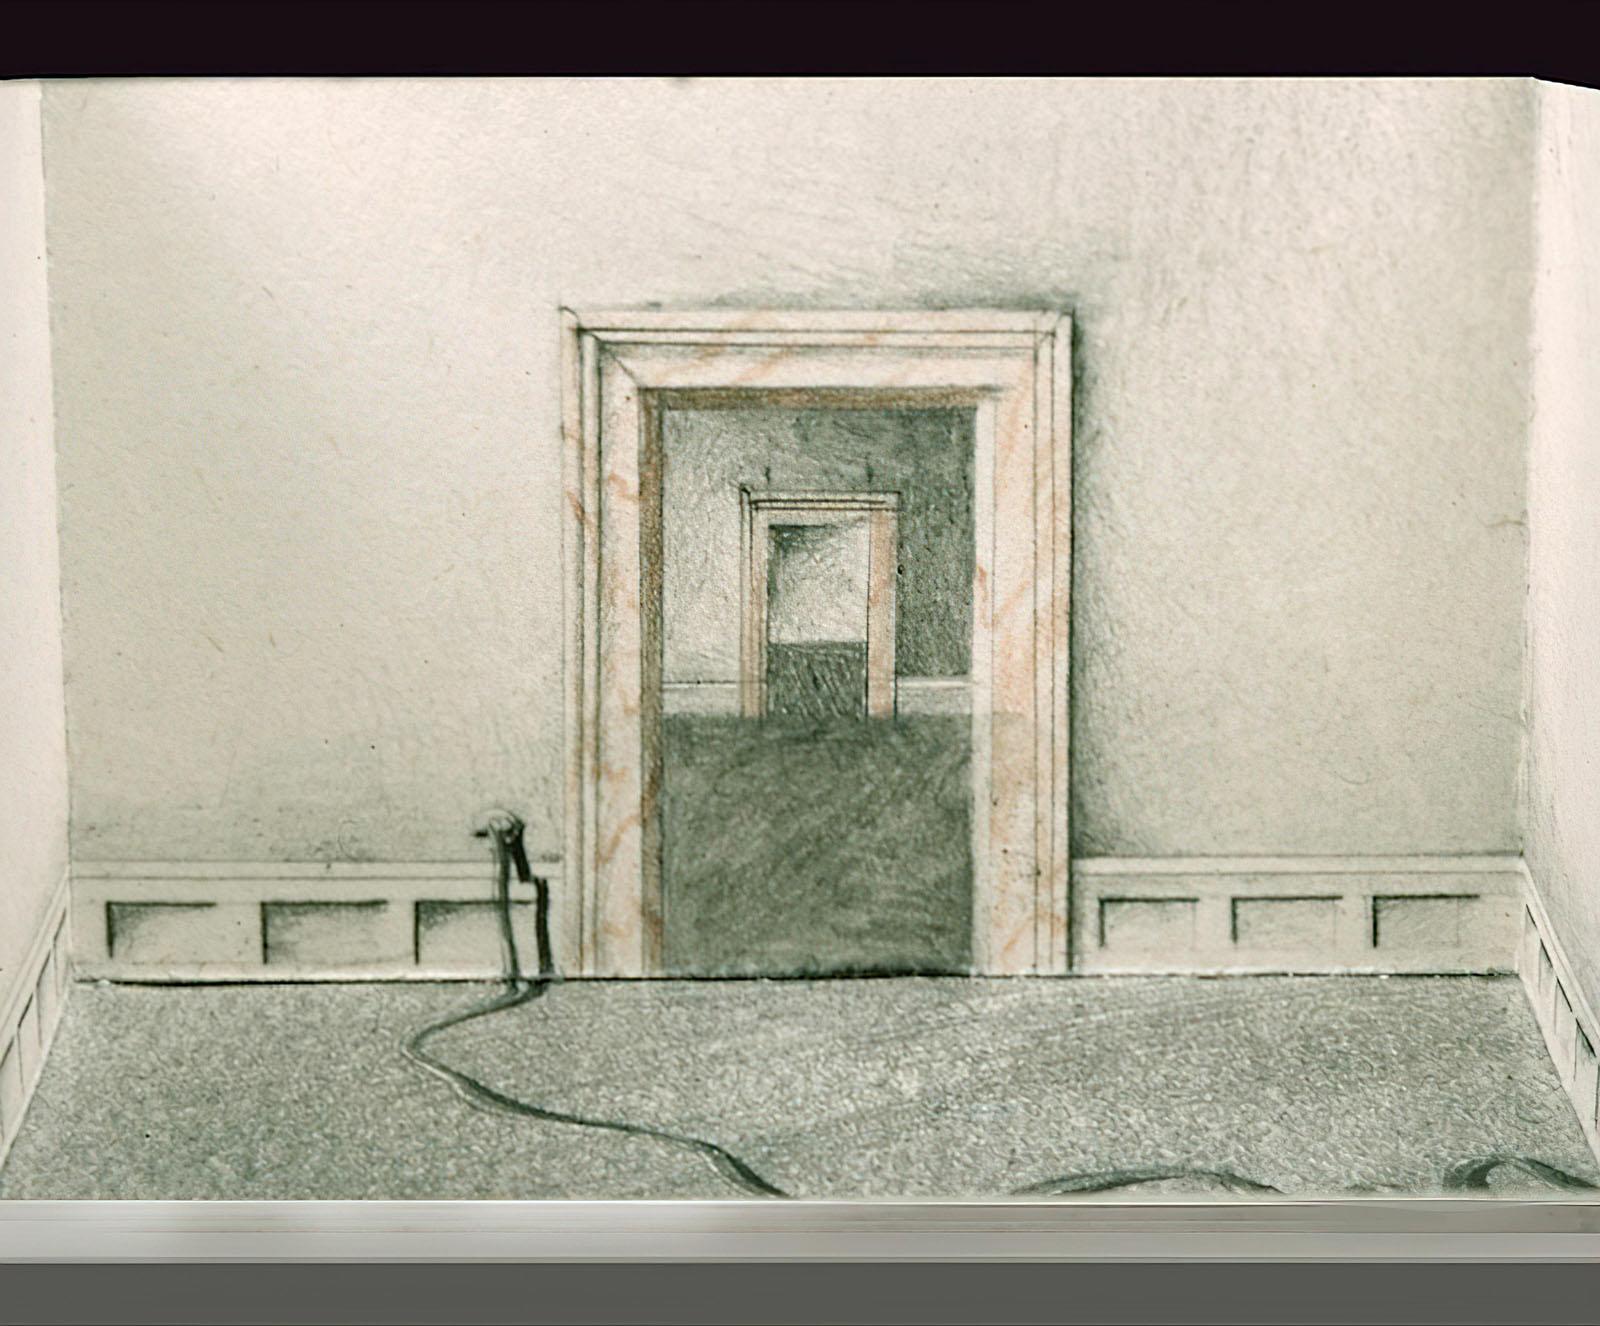 Alfred Hofkunst - Museumsraum